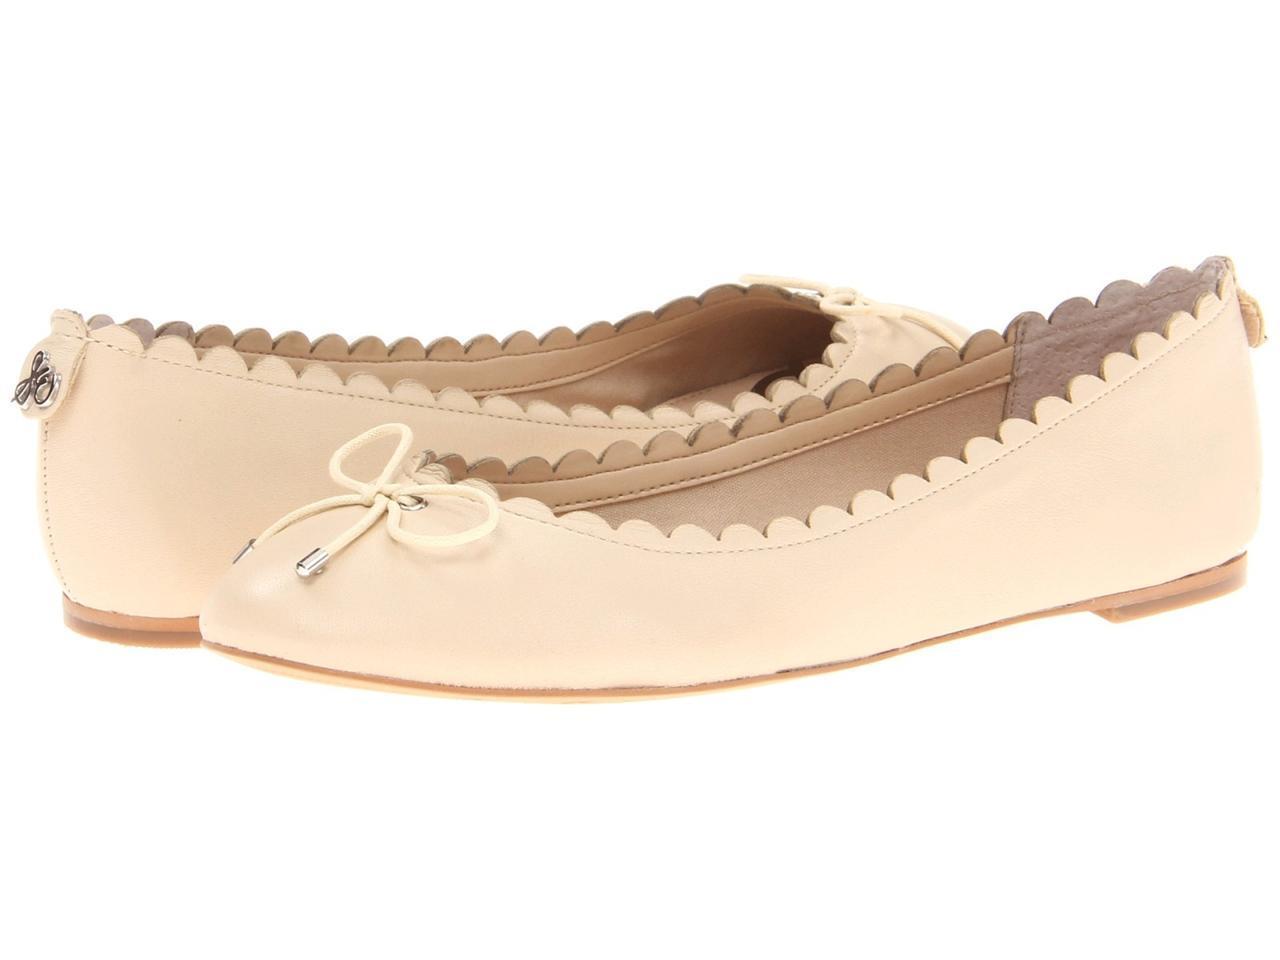 economico Sam Edelman Maria Flat Ivory Easy Easy Easy slip-on wear leather  scalloped trim bow tie  outlet